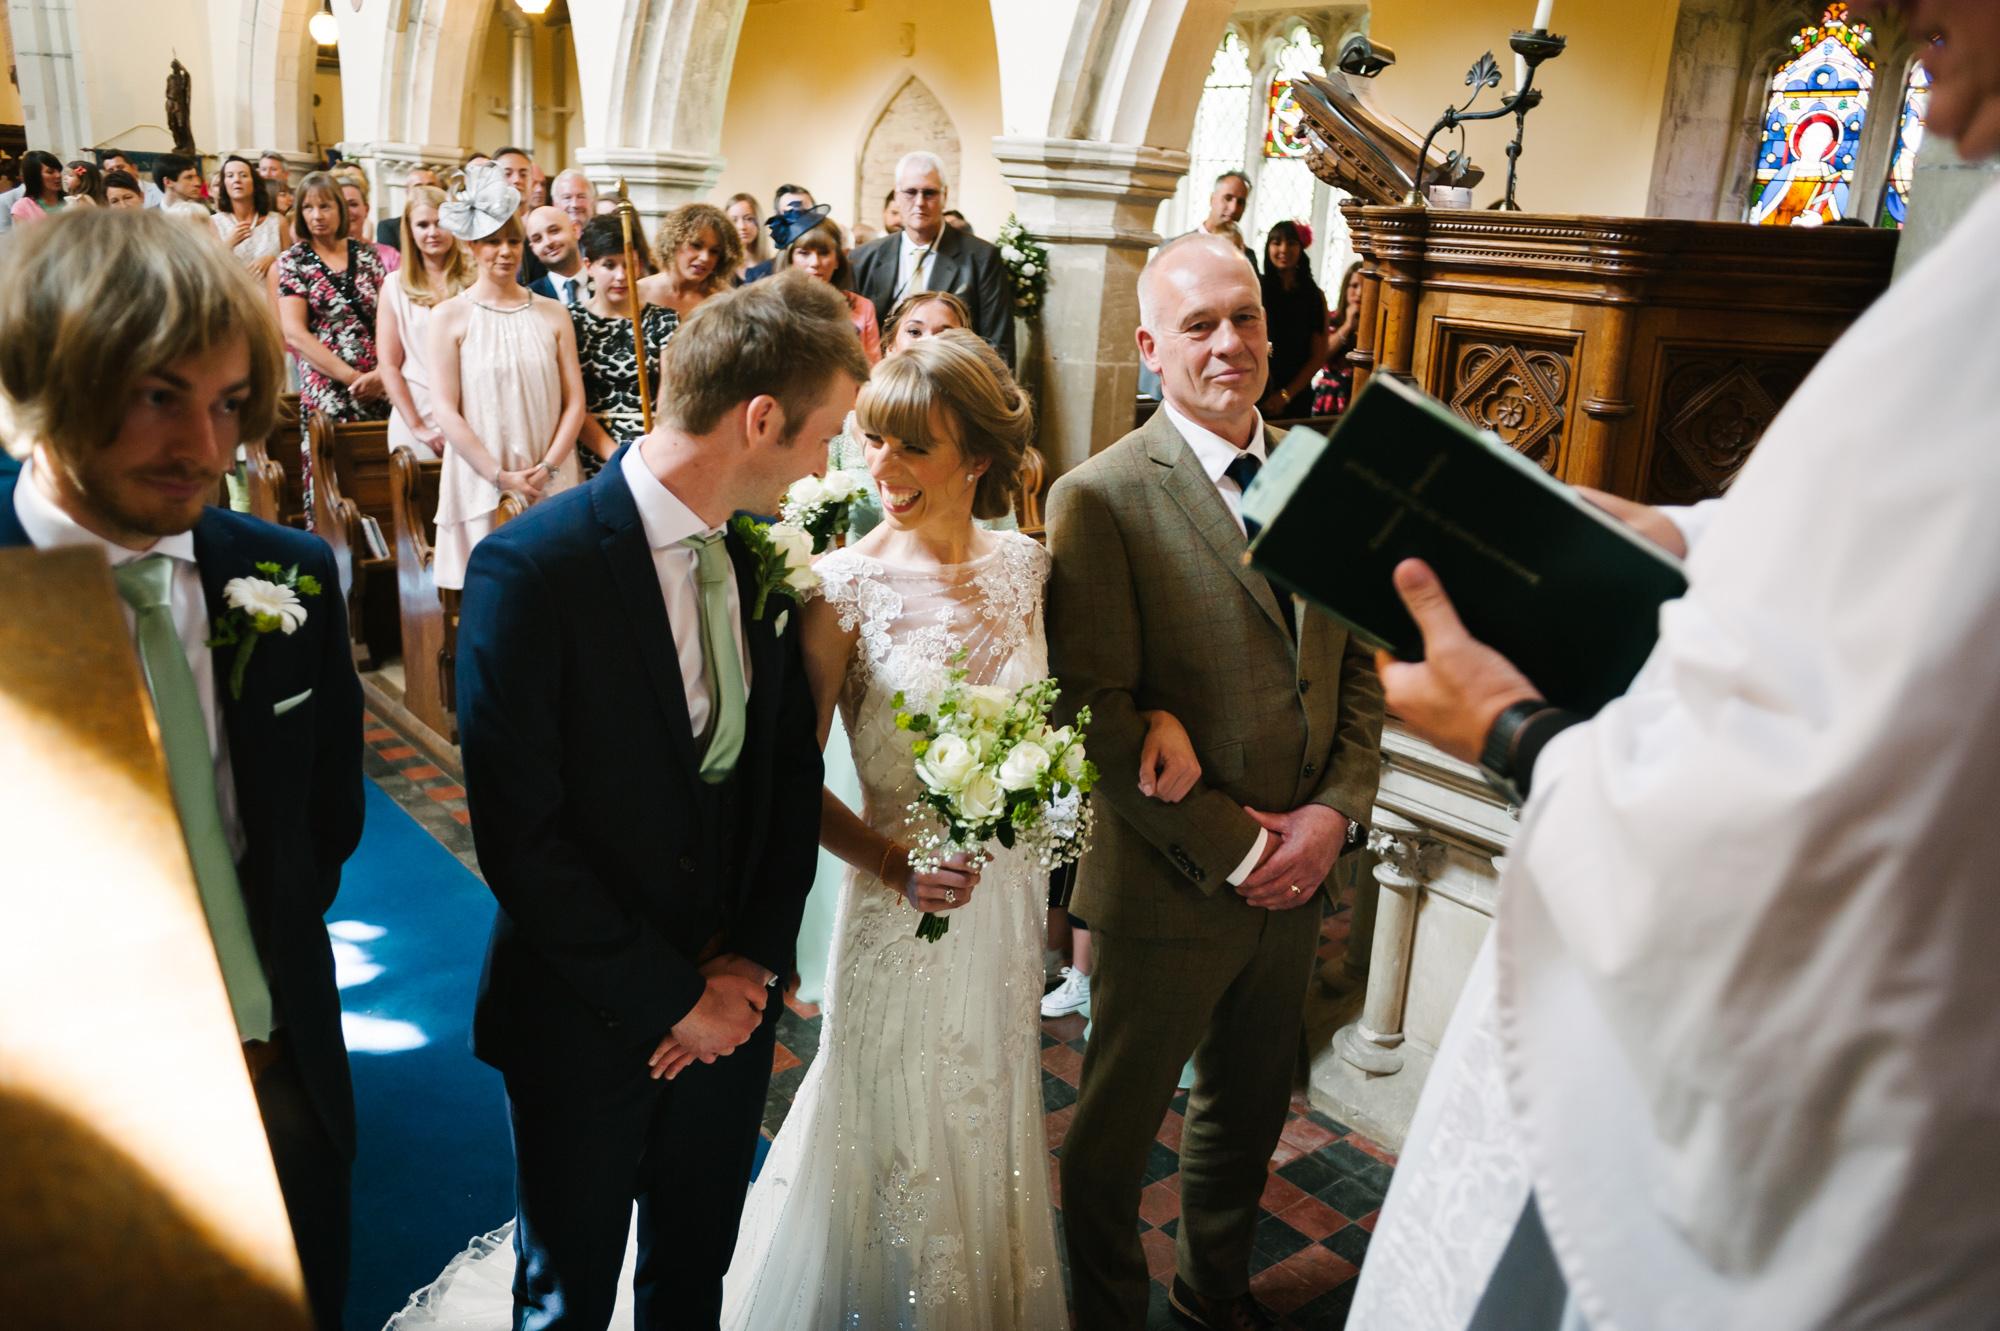 Cricket Club Wedding Tea Party Eversholt Bedfordshire-28